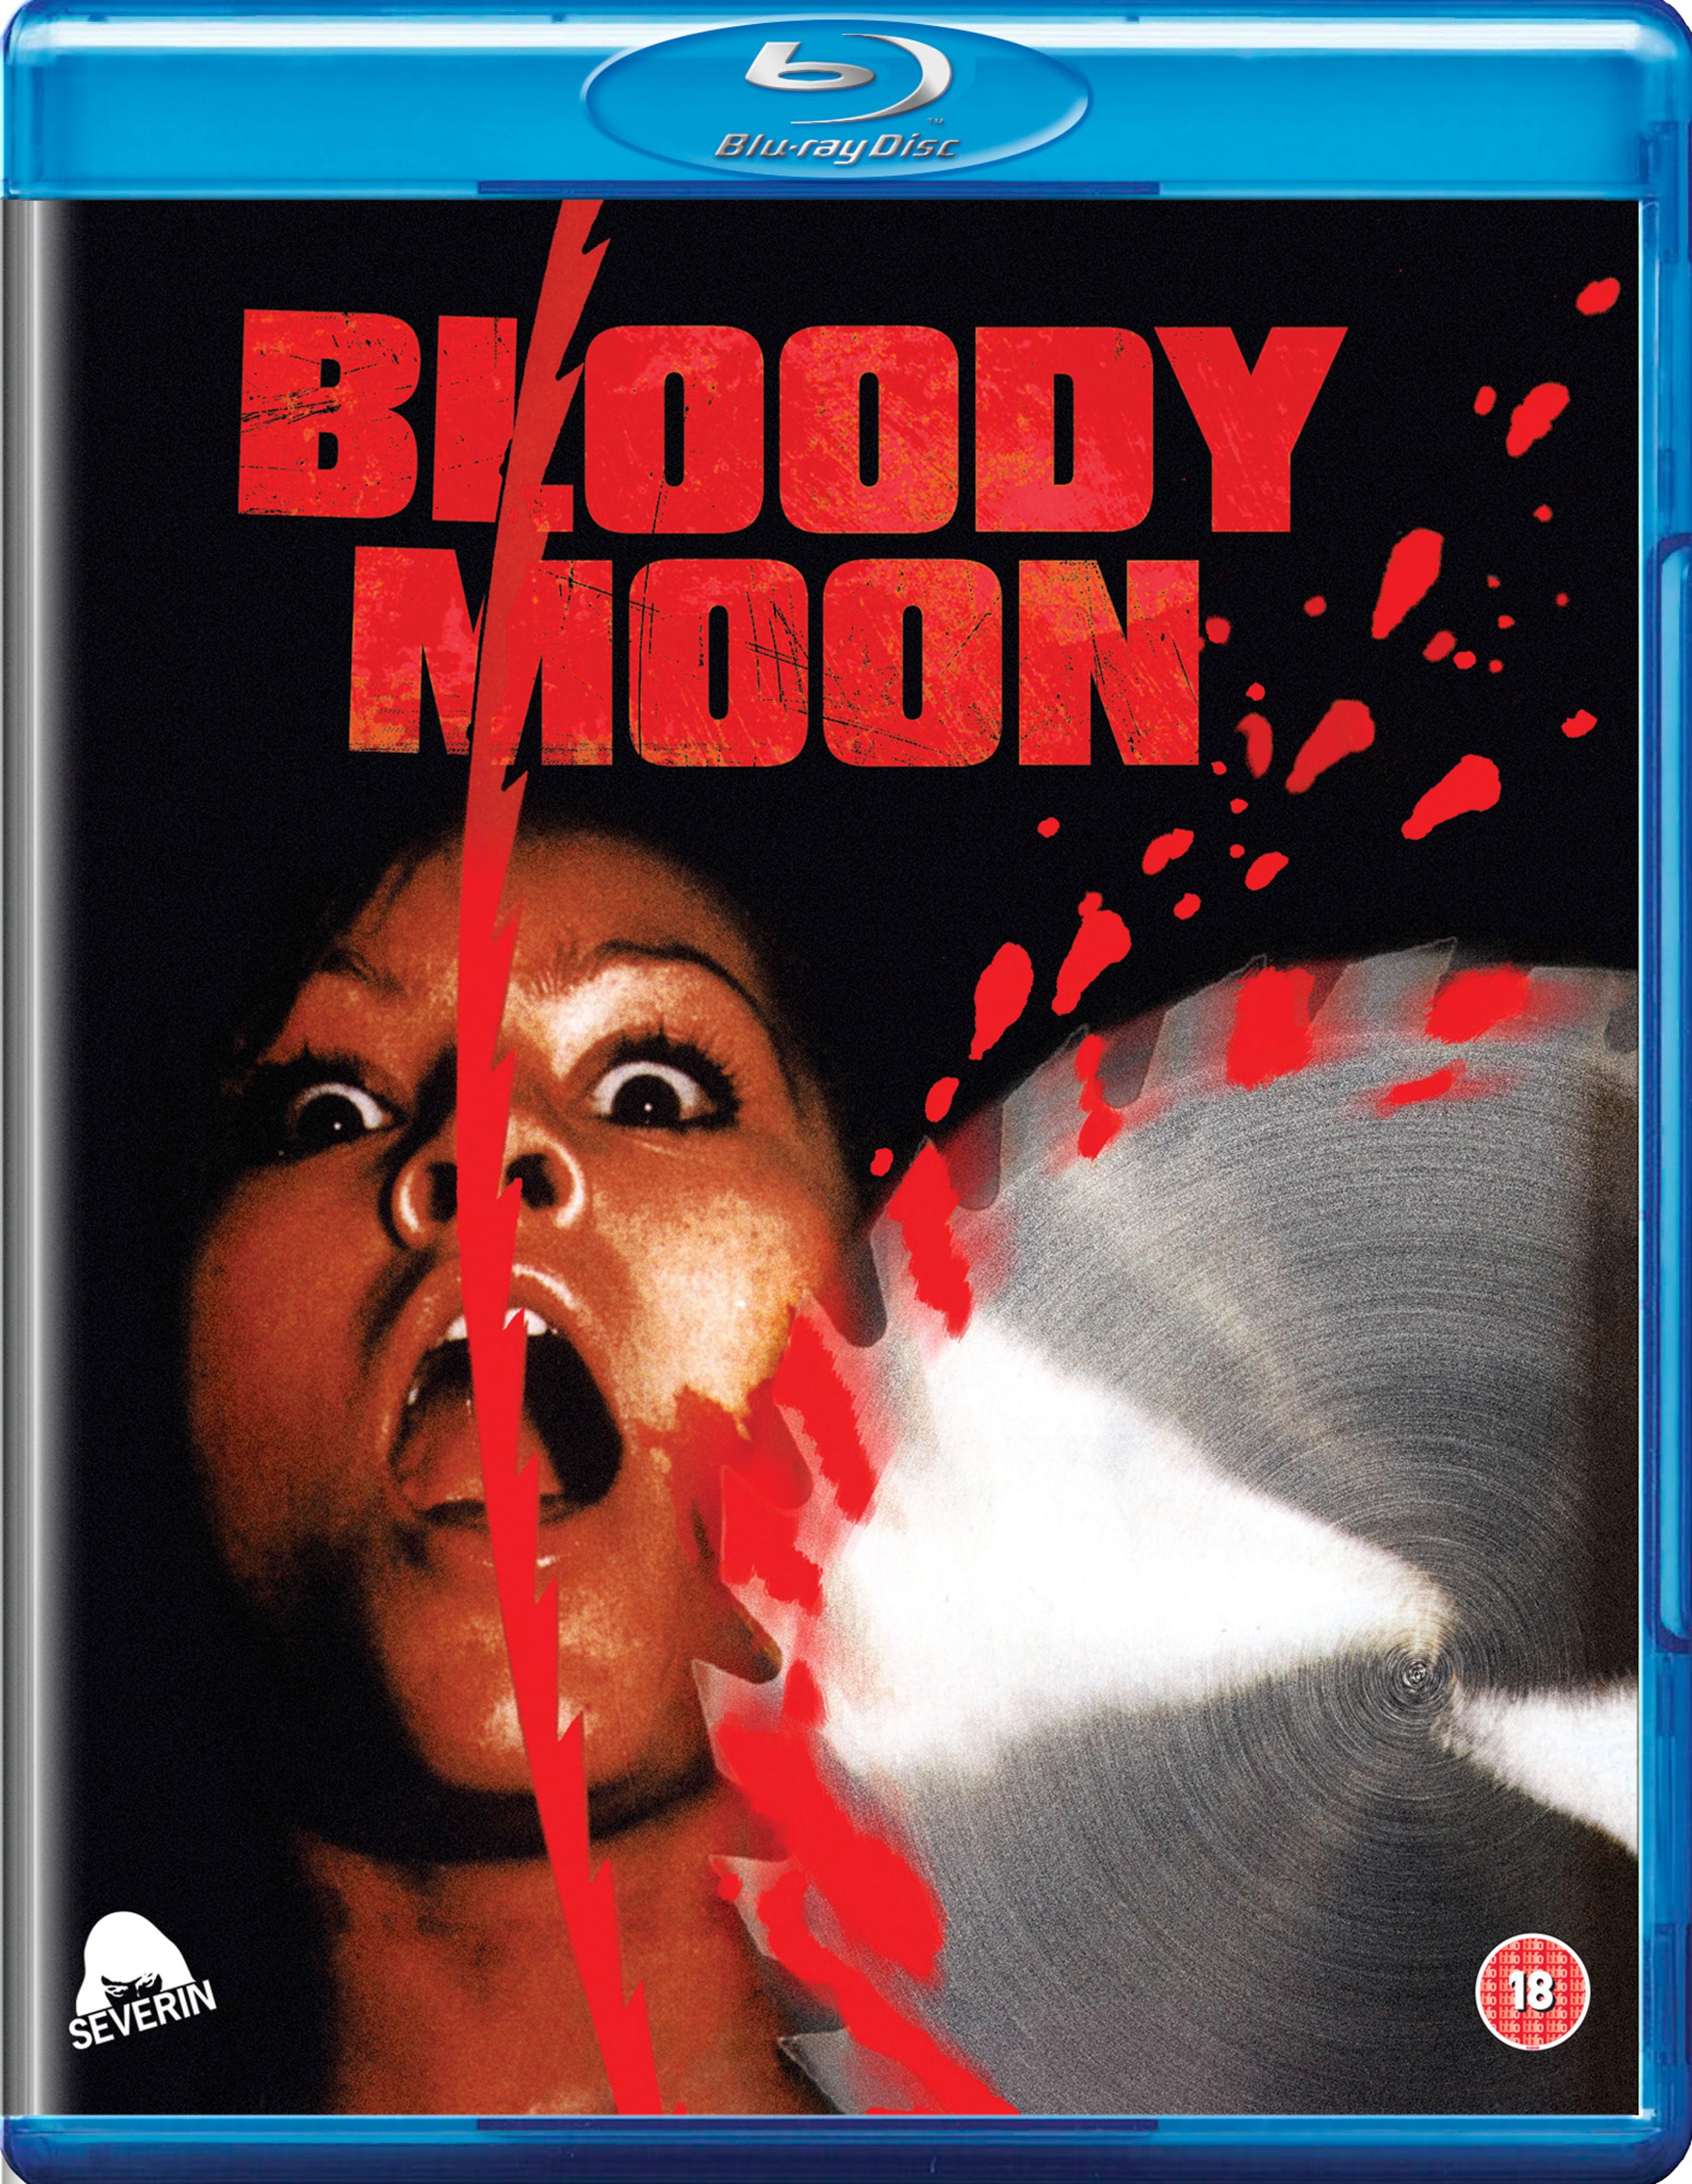 Bloody Moon - 1